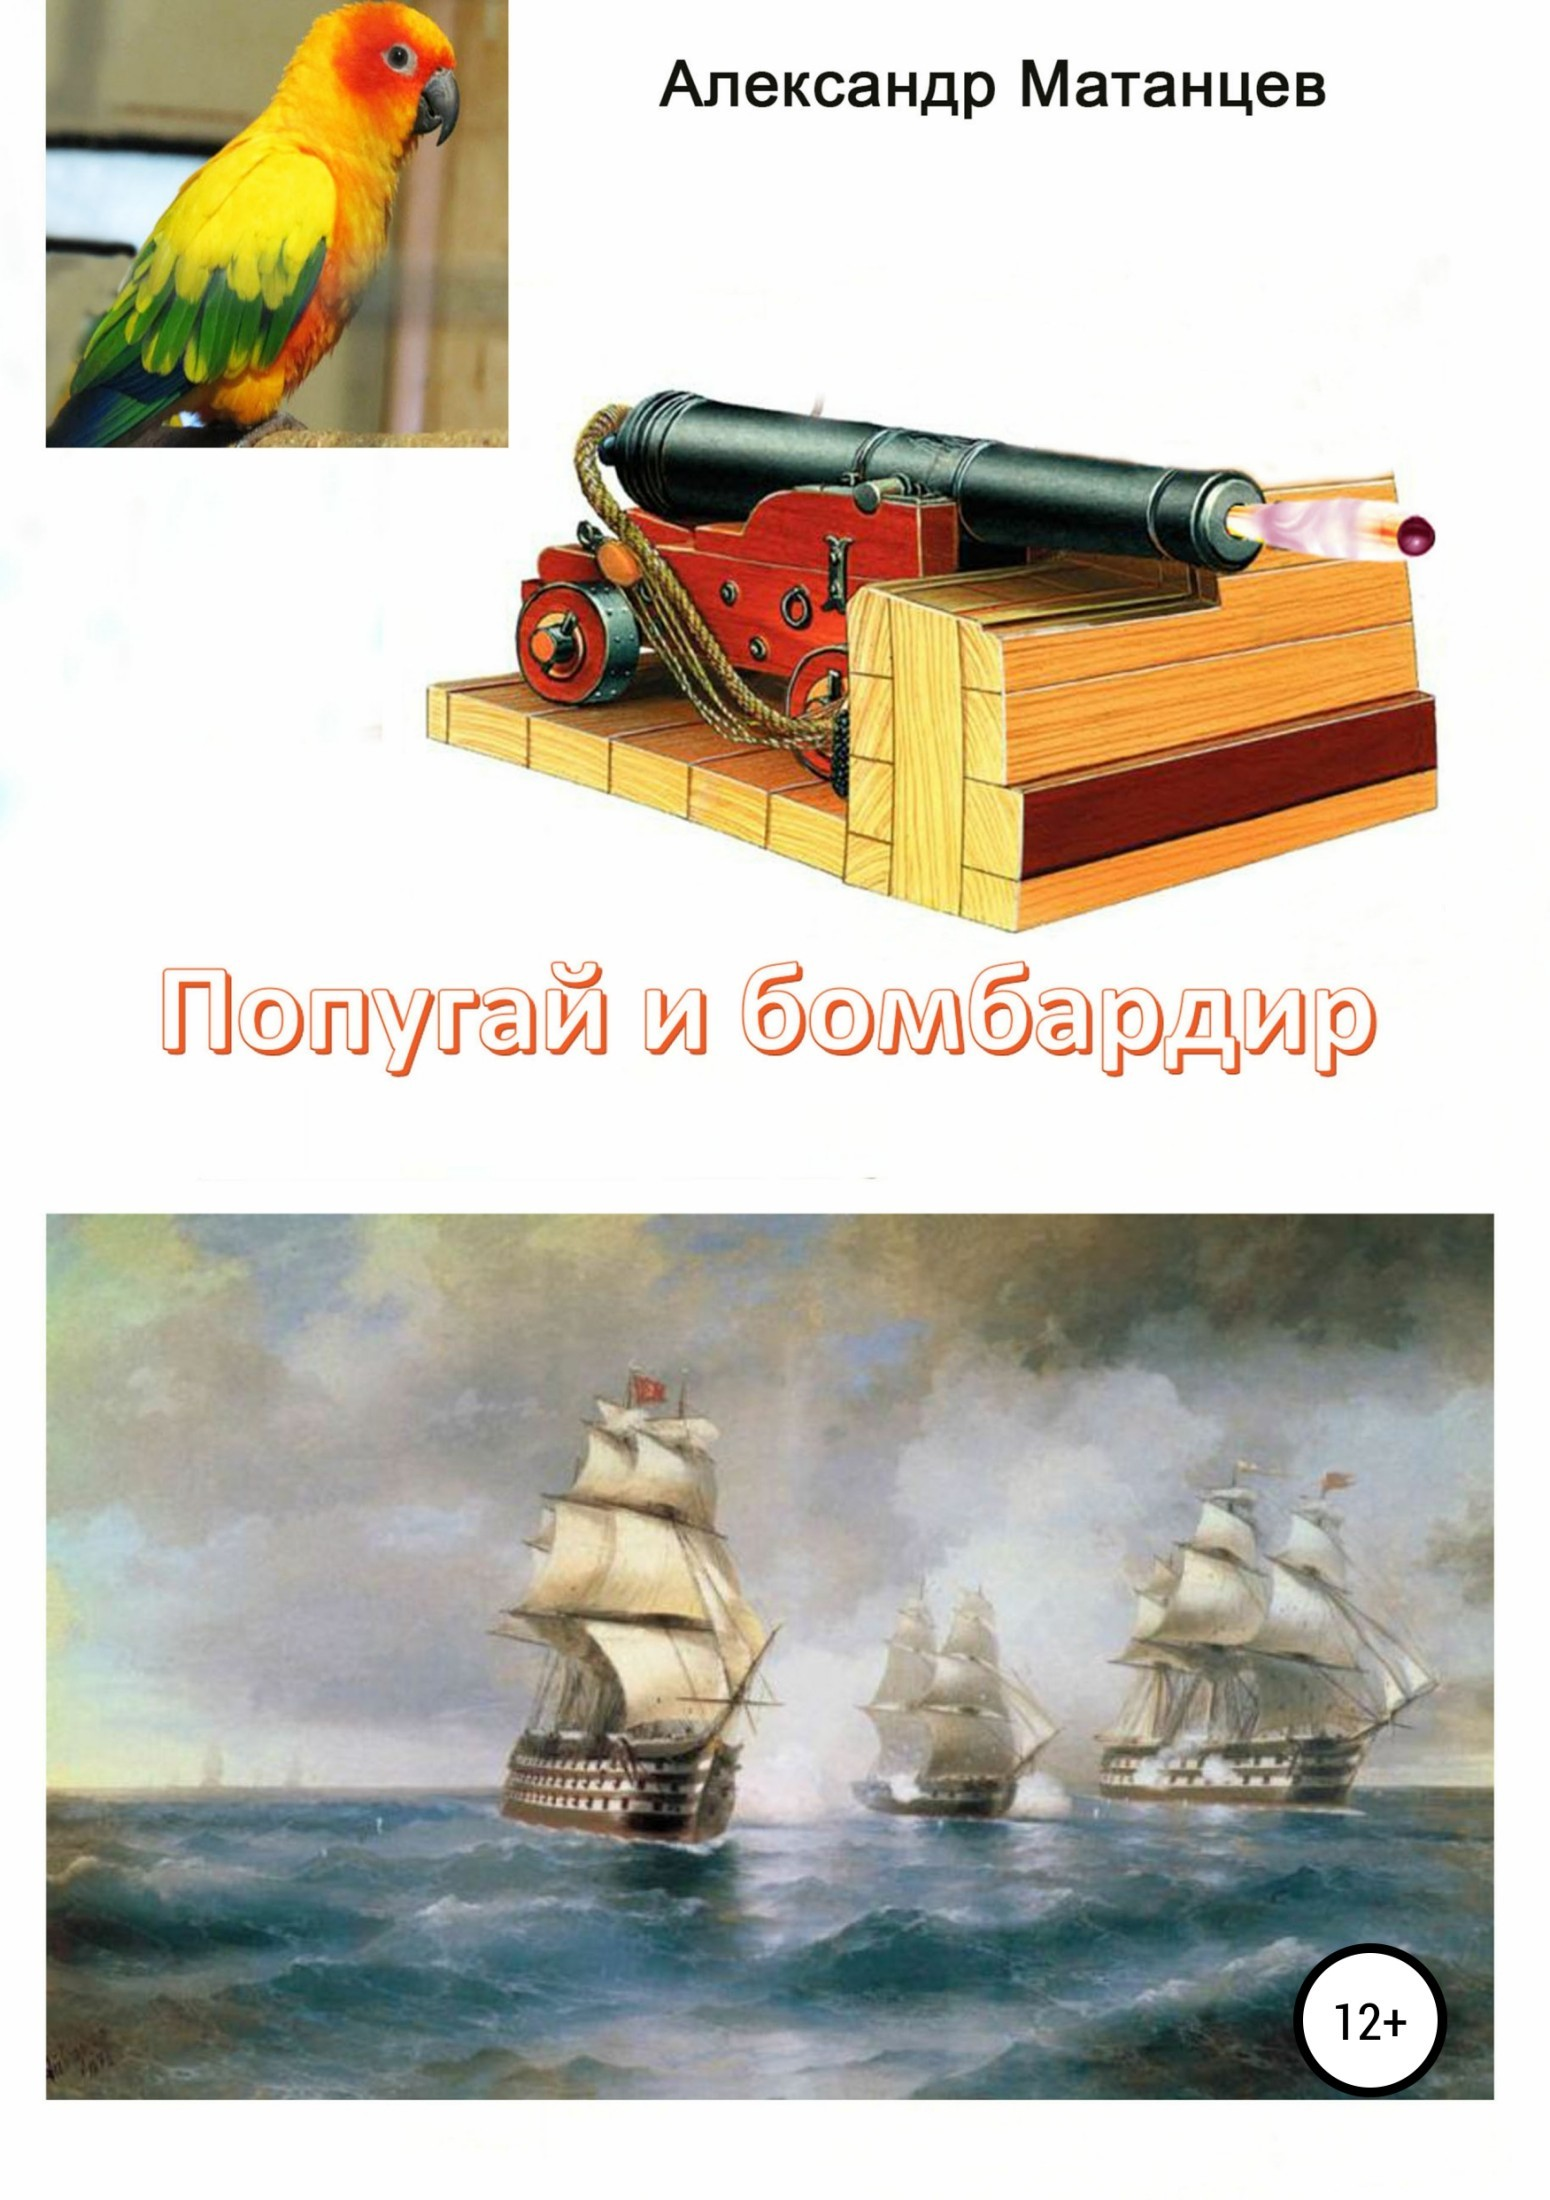 Александр Матанцев - Попугай и бомбардир